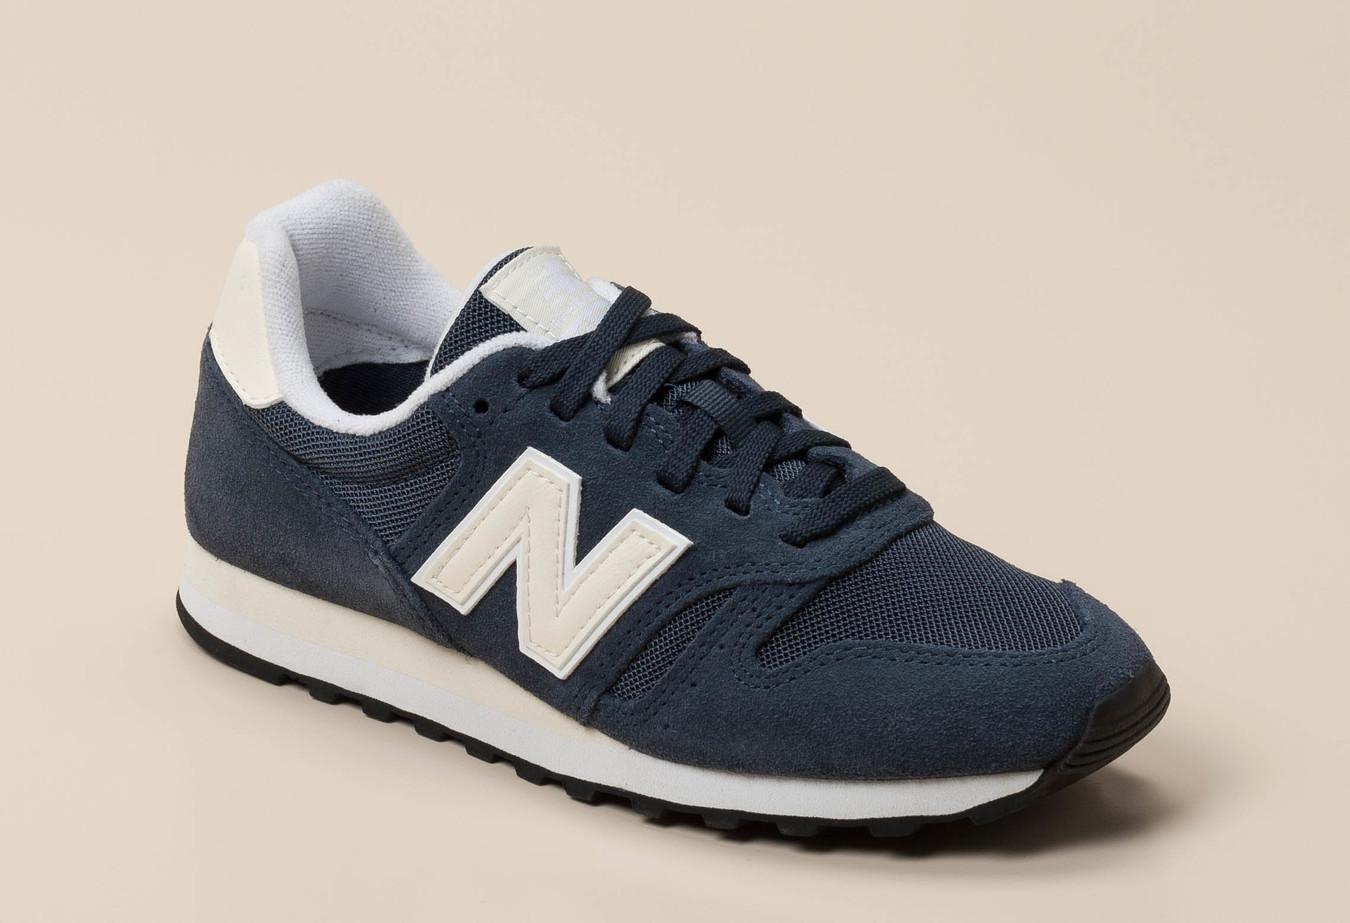 separation shoes 784e0 6cf3e New Balance Damen Sneaker in dunkelblau kaufen | Zumnorde Online-Shop